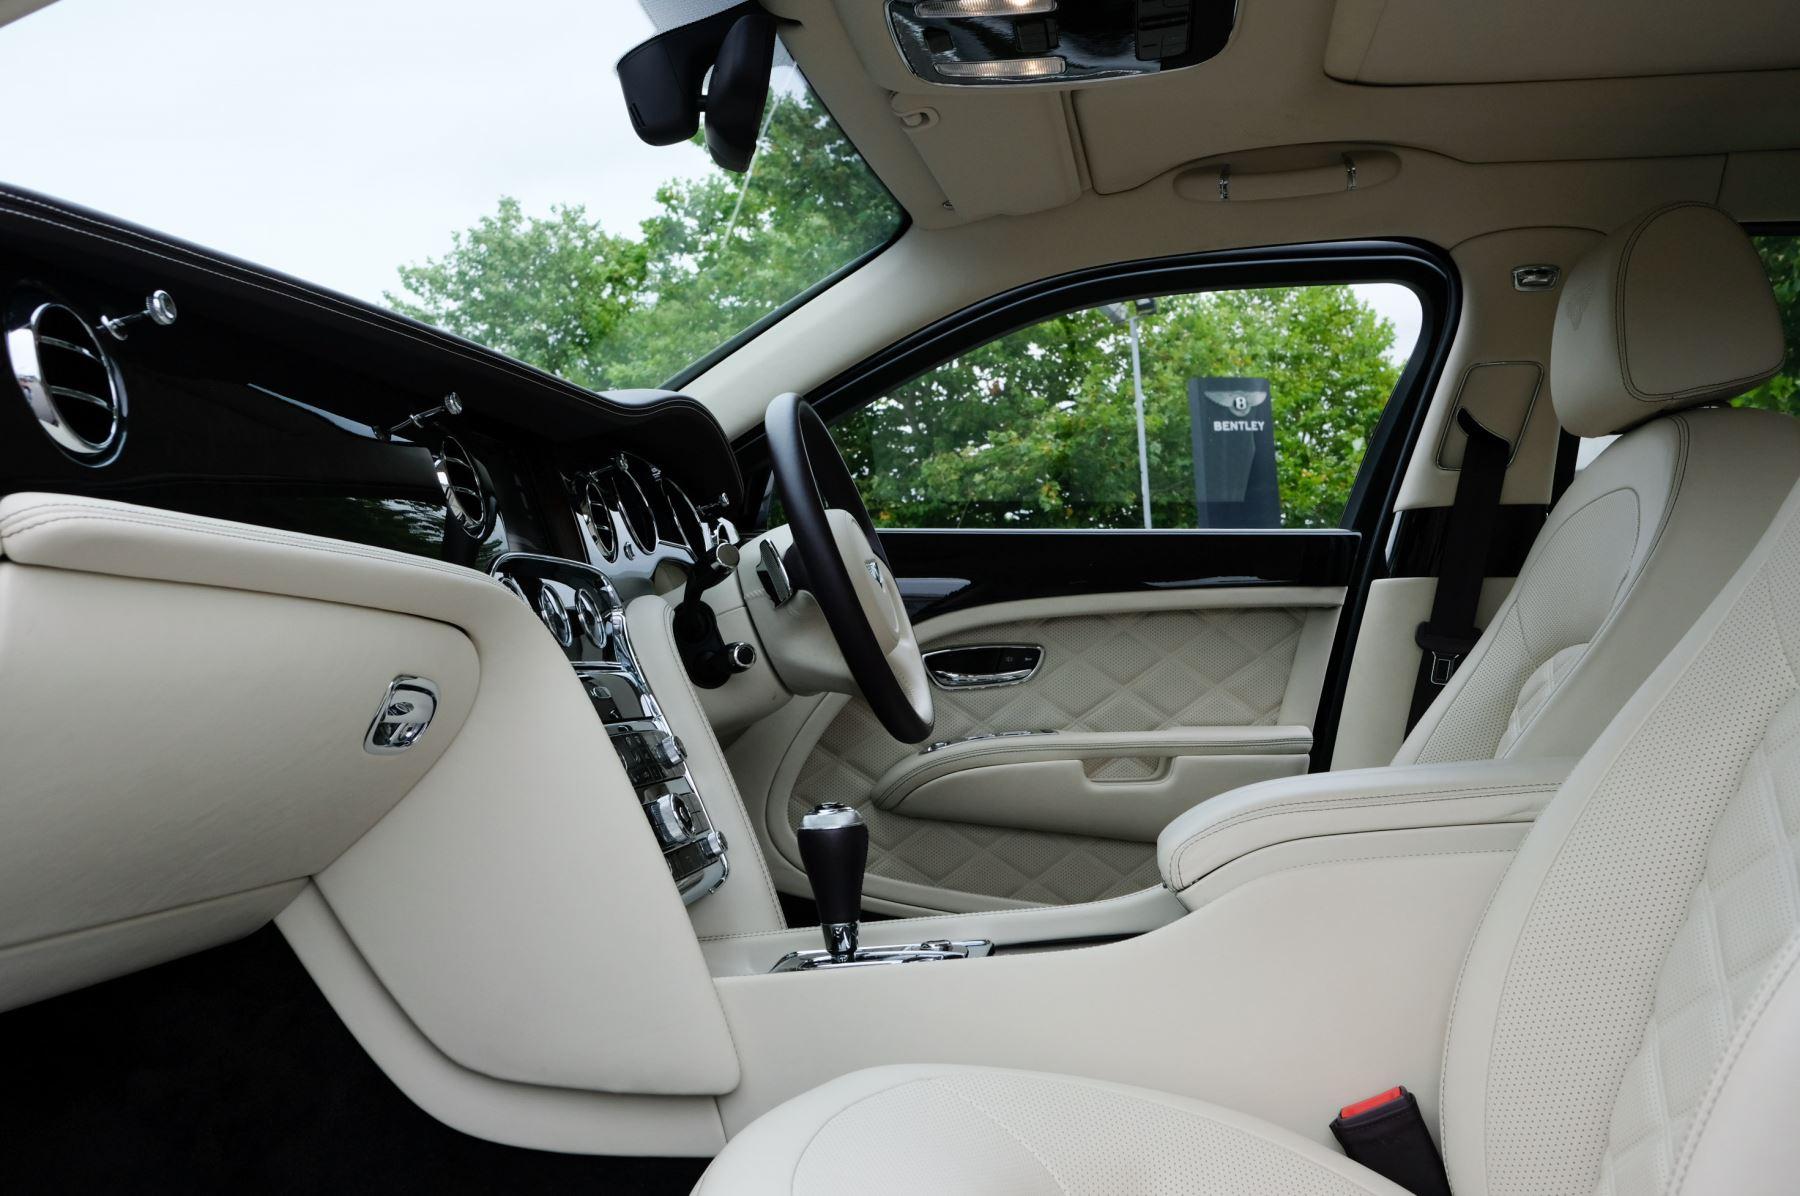 Bentley Mulsanne 6.8 V8 Speed - Speed Premier Specification image 31